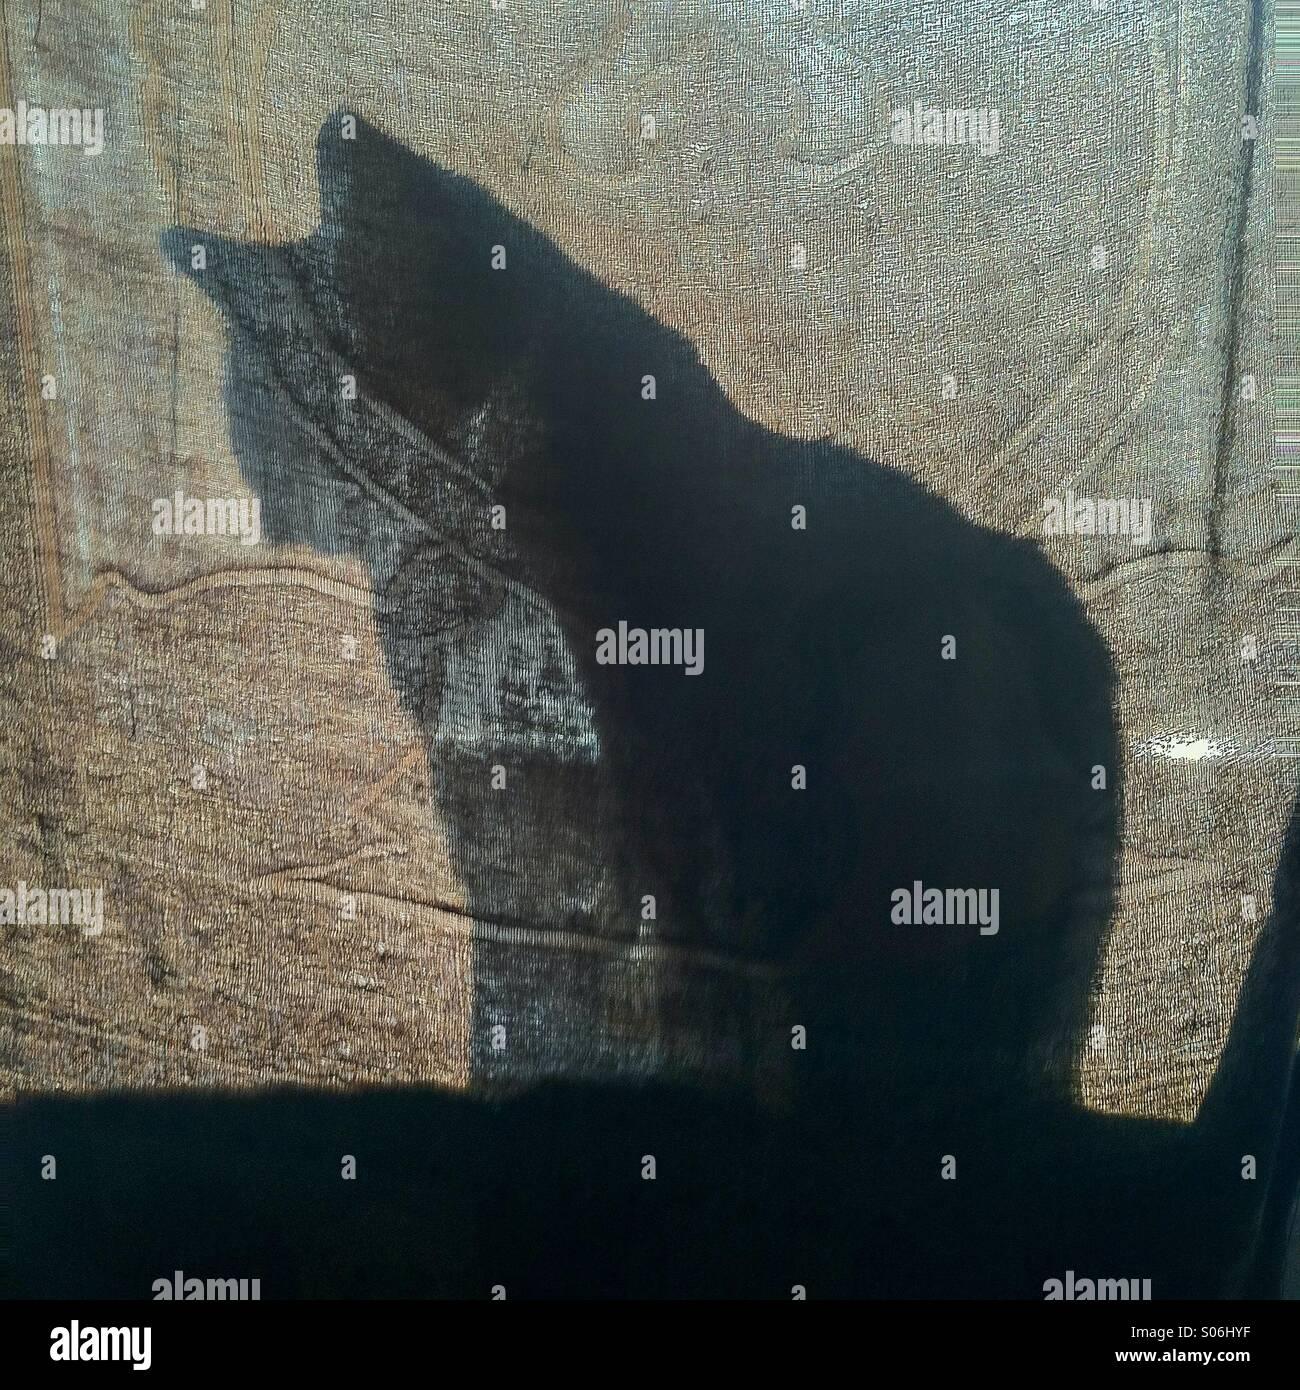 Katze Silhouette durch Stoff Stockbild